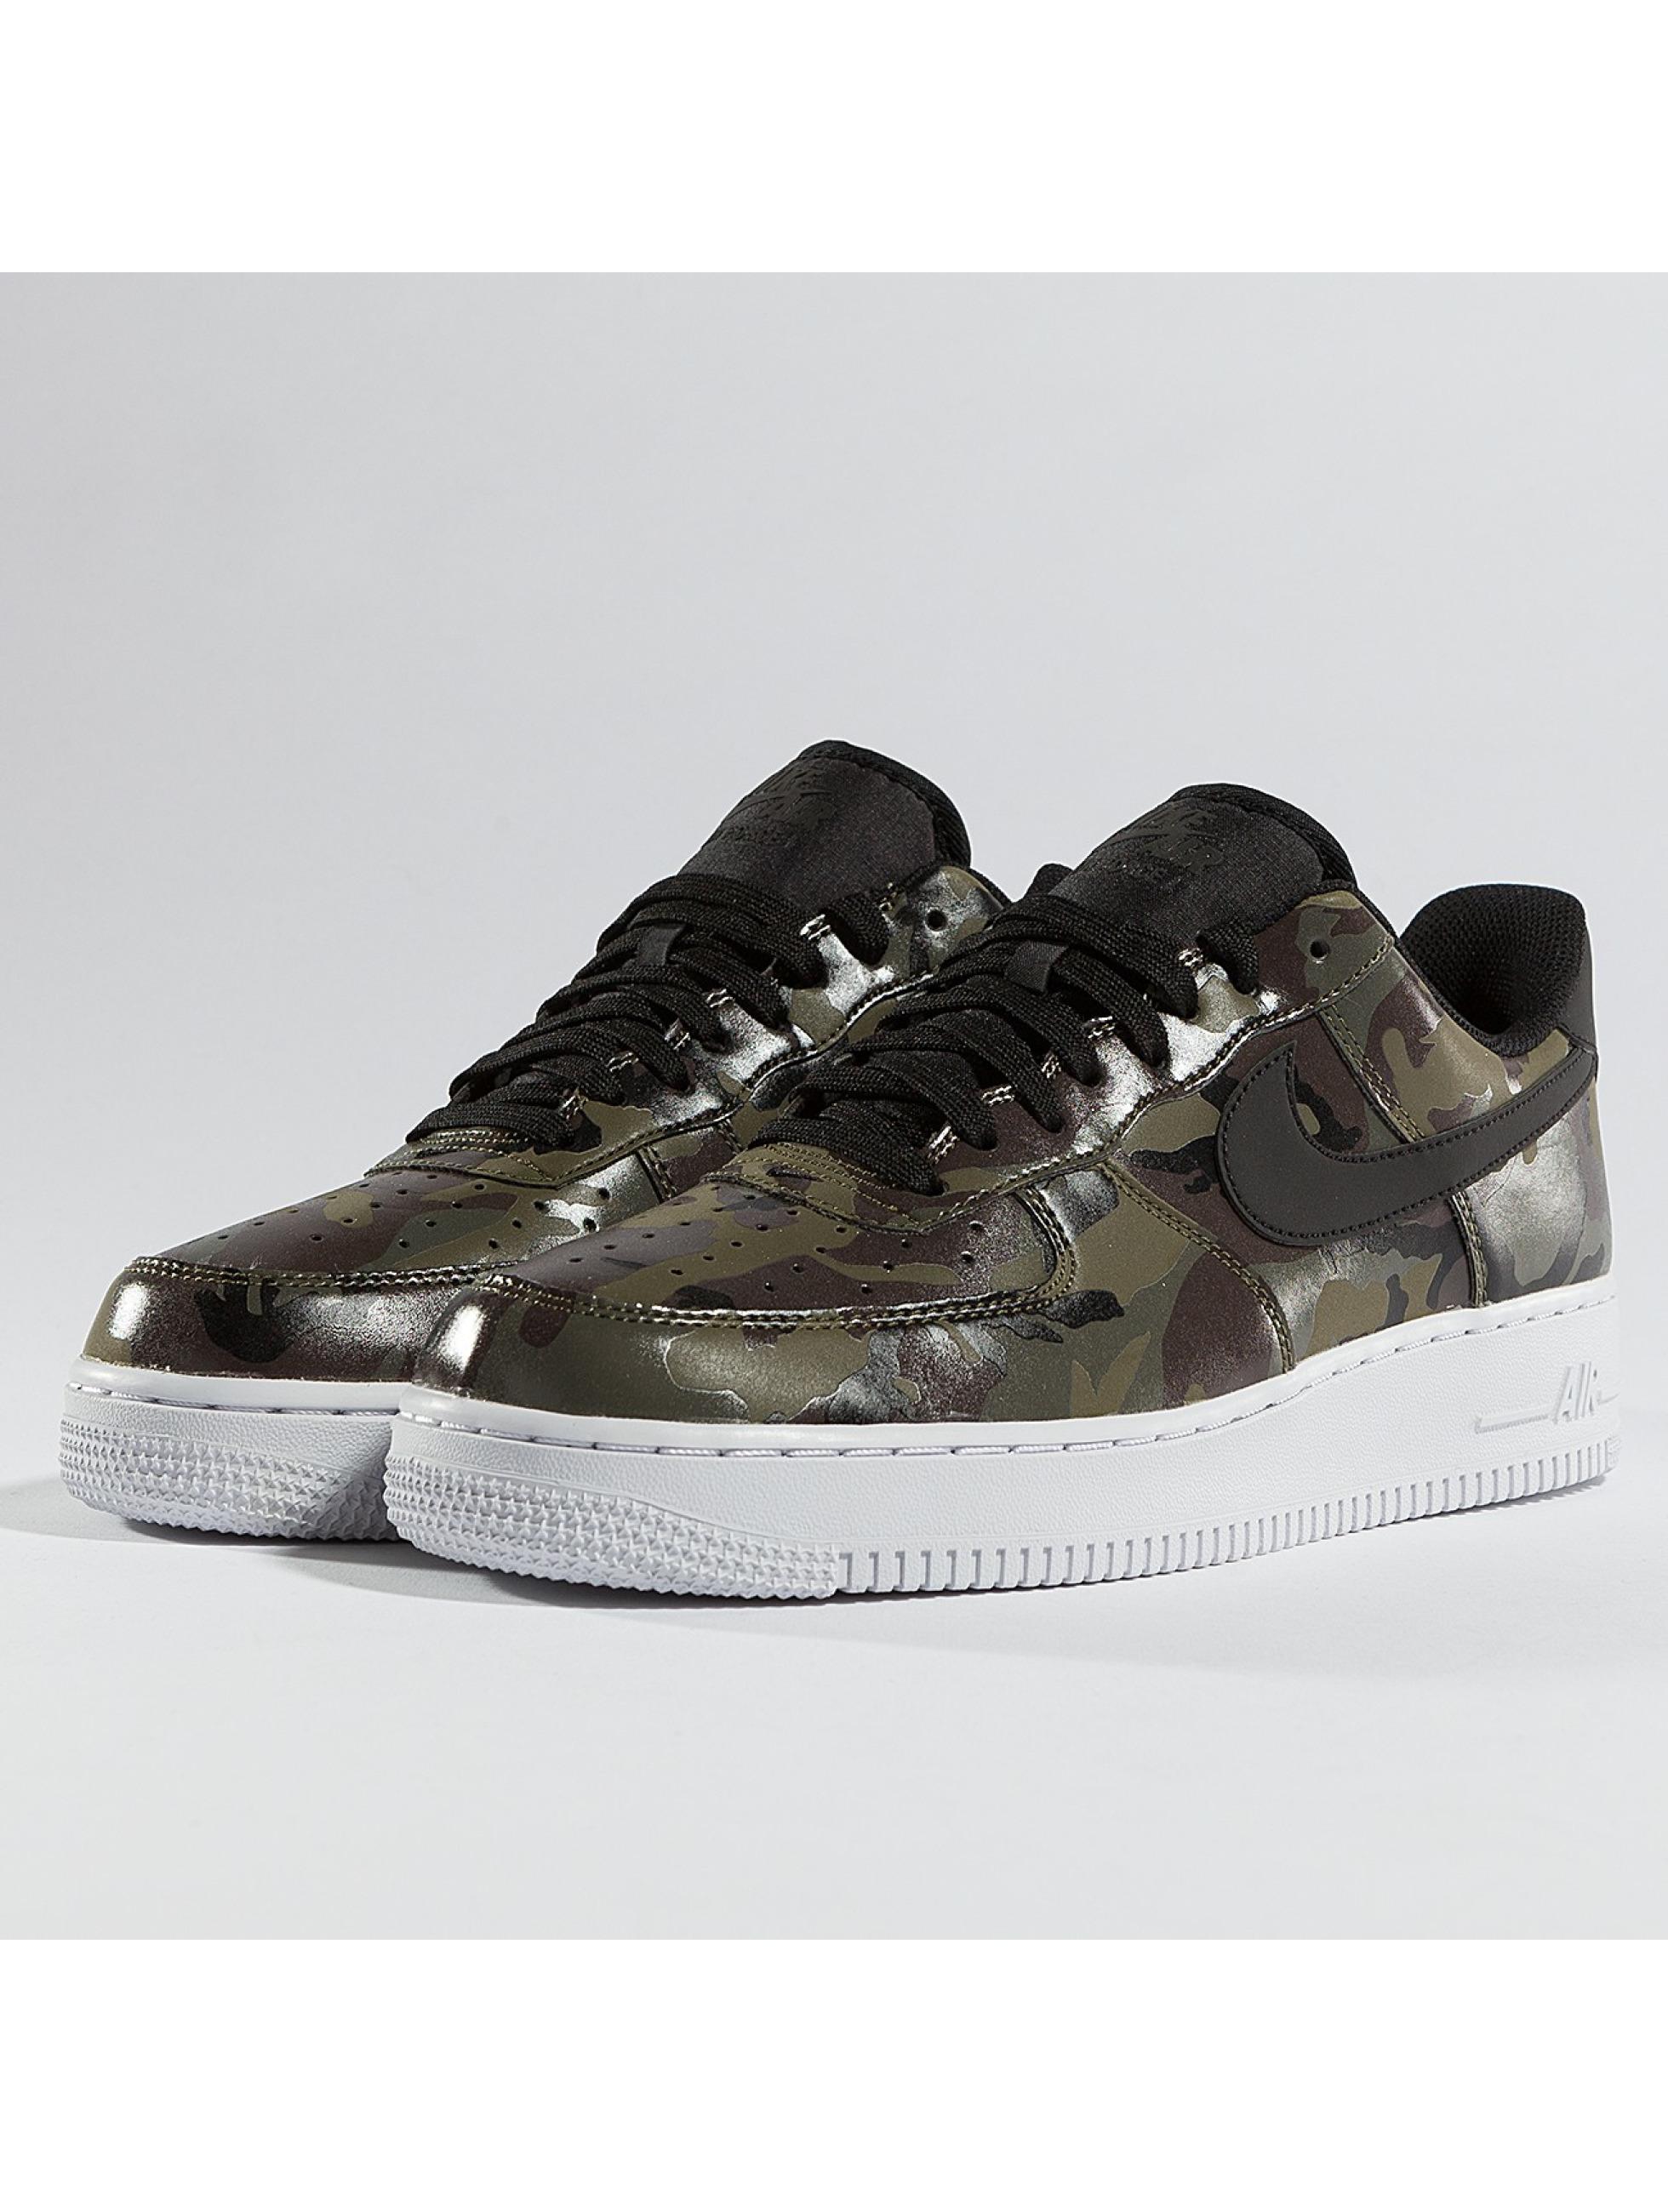 Nike Zapatillas de deporte Air Force 1 07' LV8 camuflaje